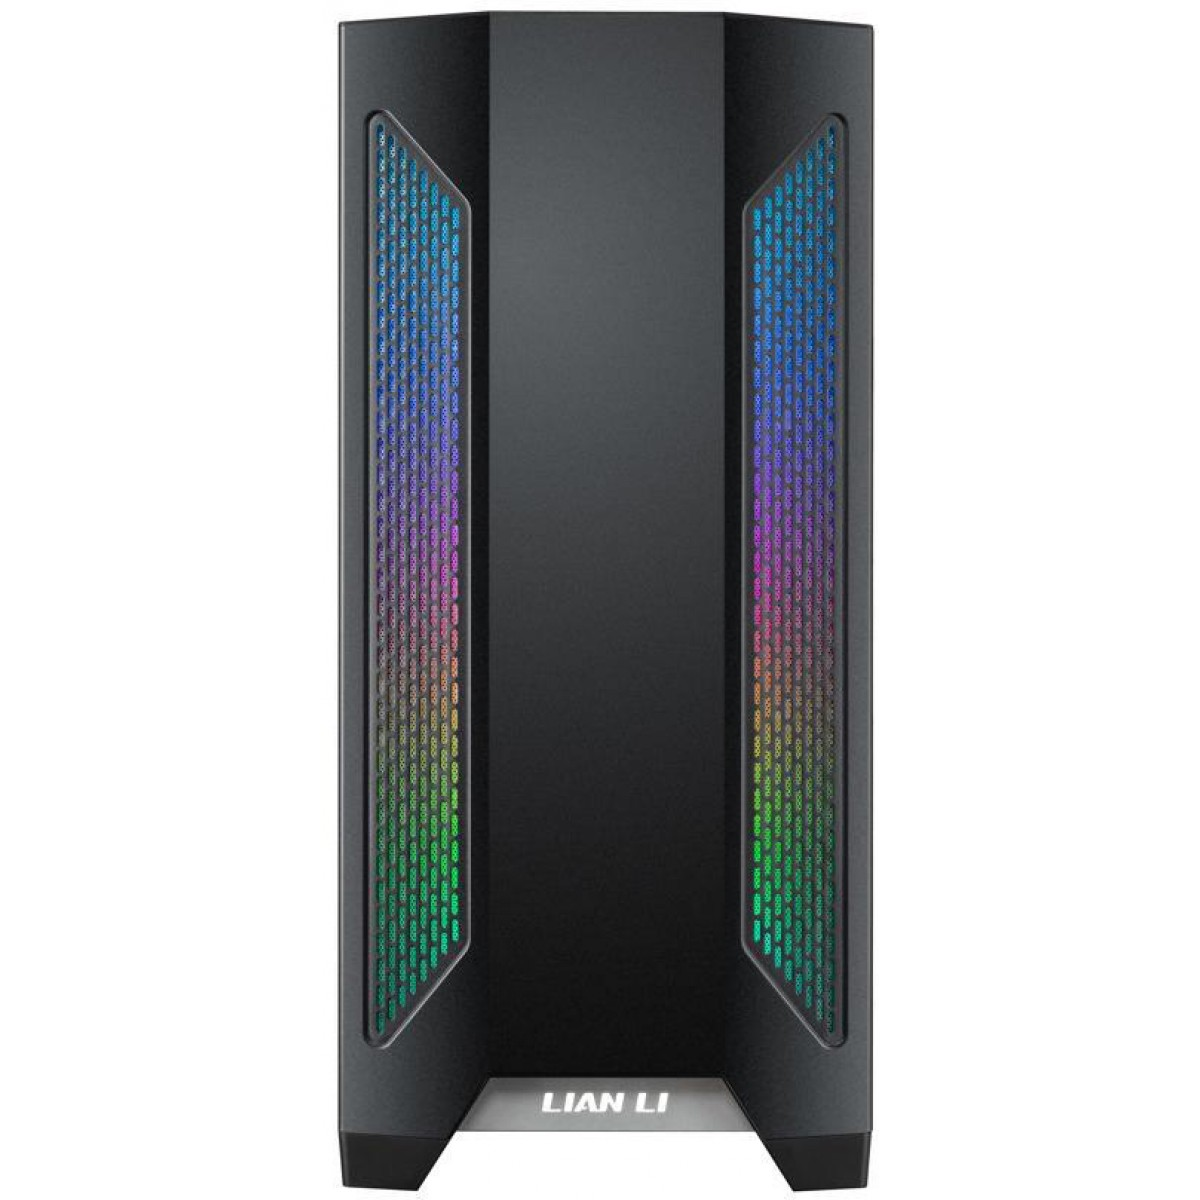 Gabinete Gamer Lian Li Lancool II RGB, Mid Tower, Vidro Temperado, black, S-Fonte